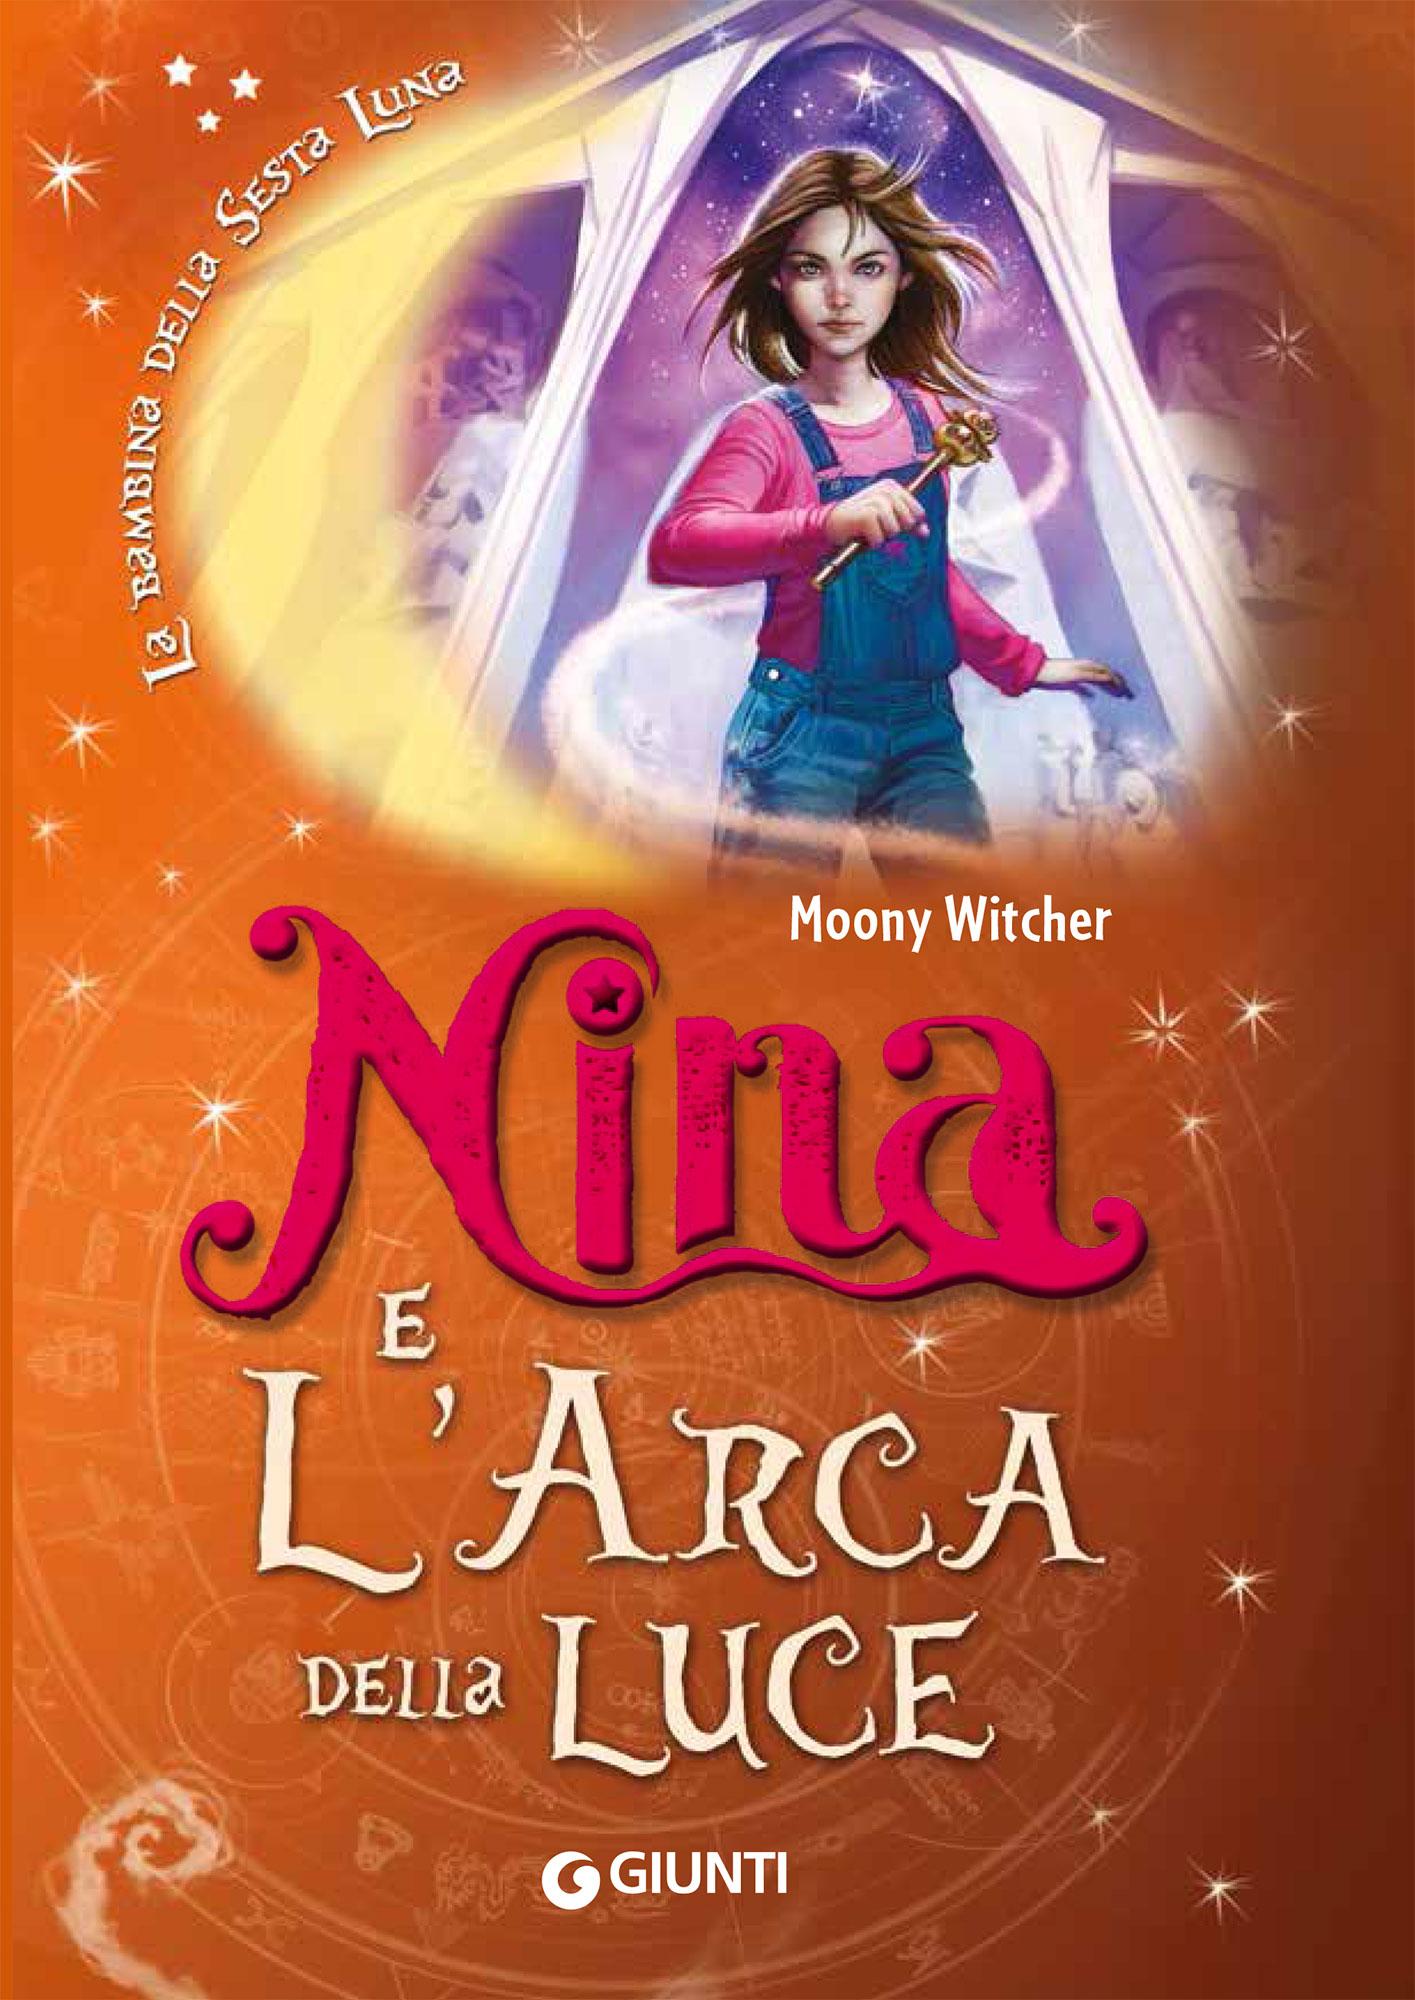 Nina e l'arca della luce 7 MOONY WITCHER